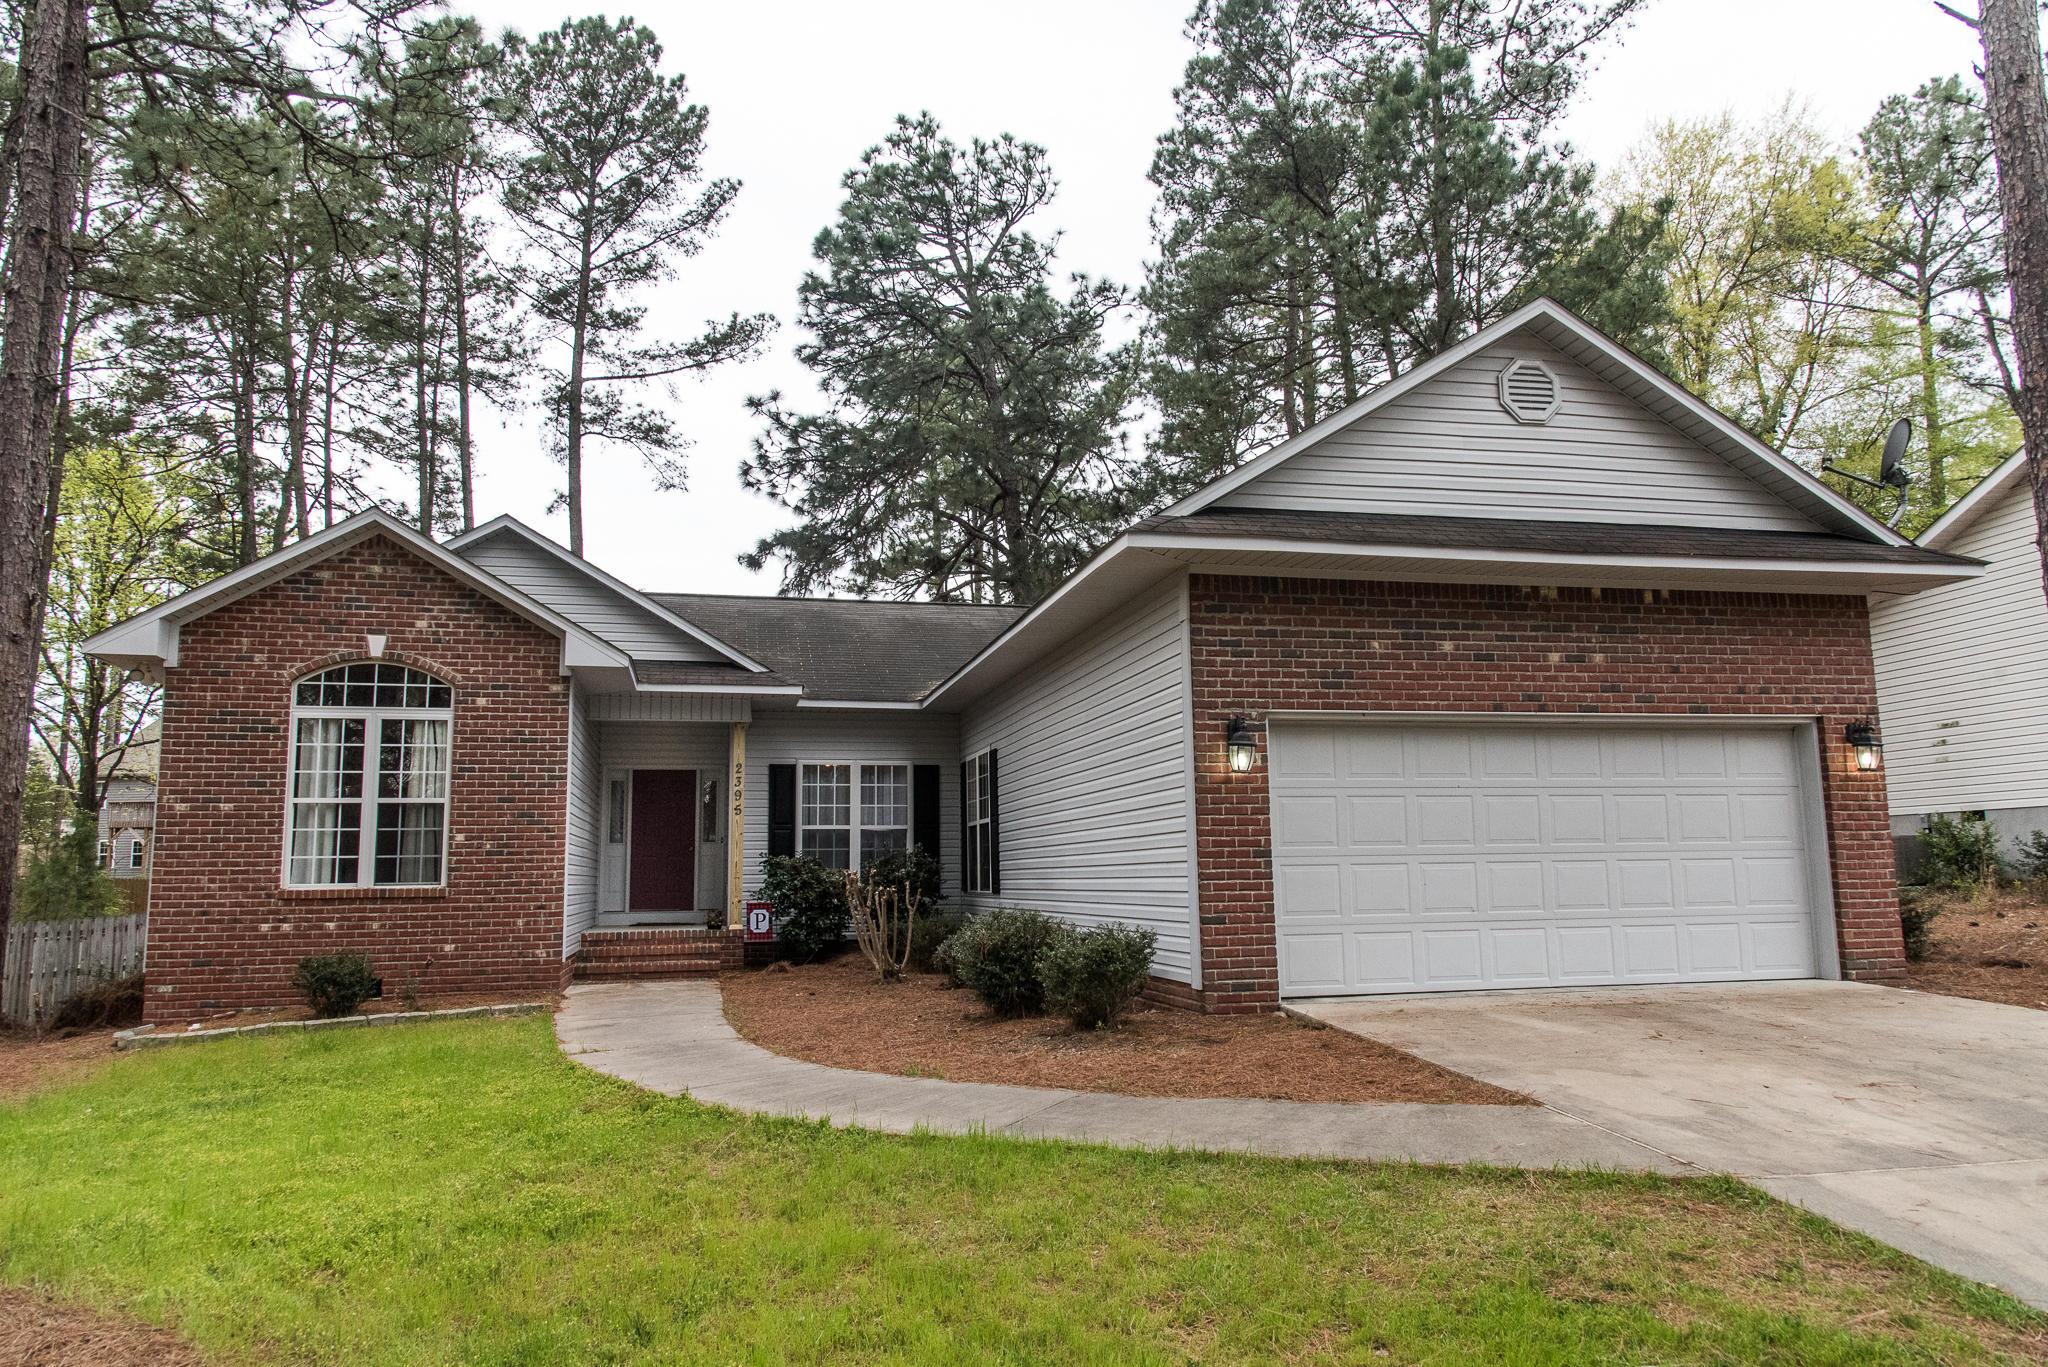 2395  Longleaf Drive W, Pinehurst in Moore County, NC 28374 Home for Sale